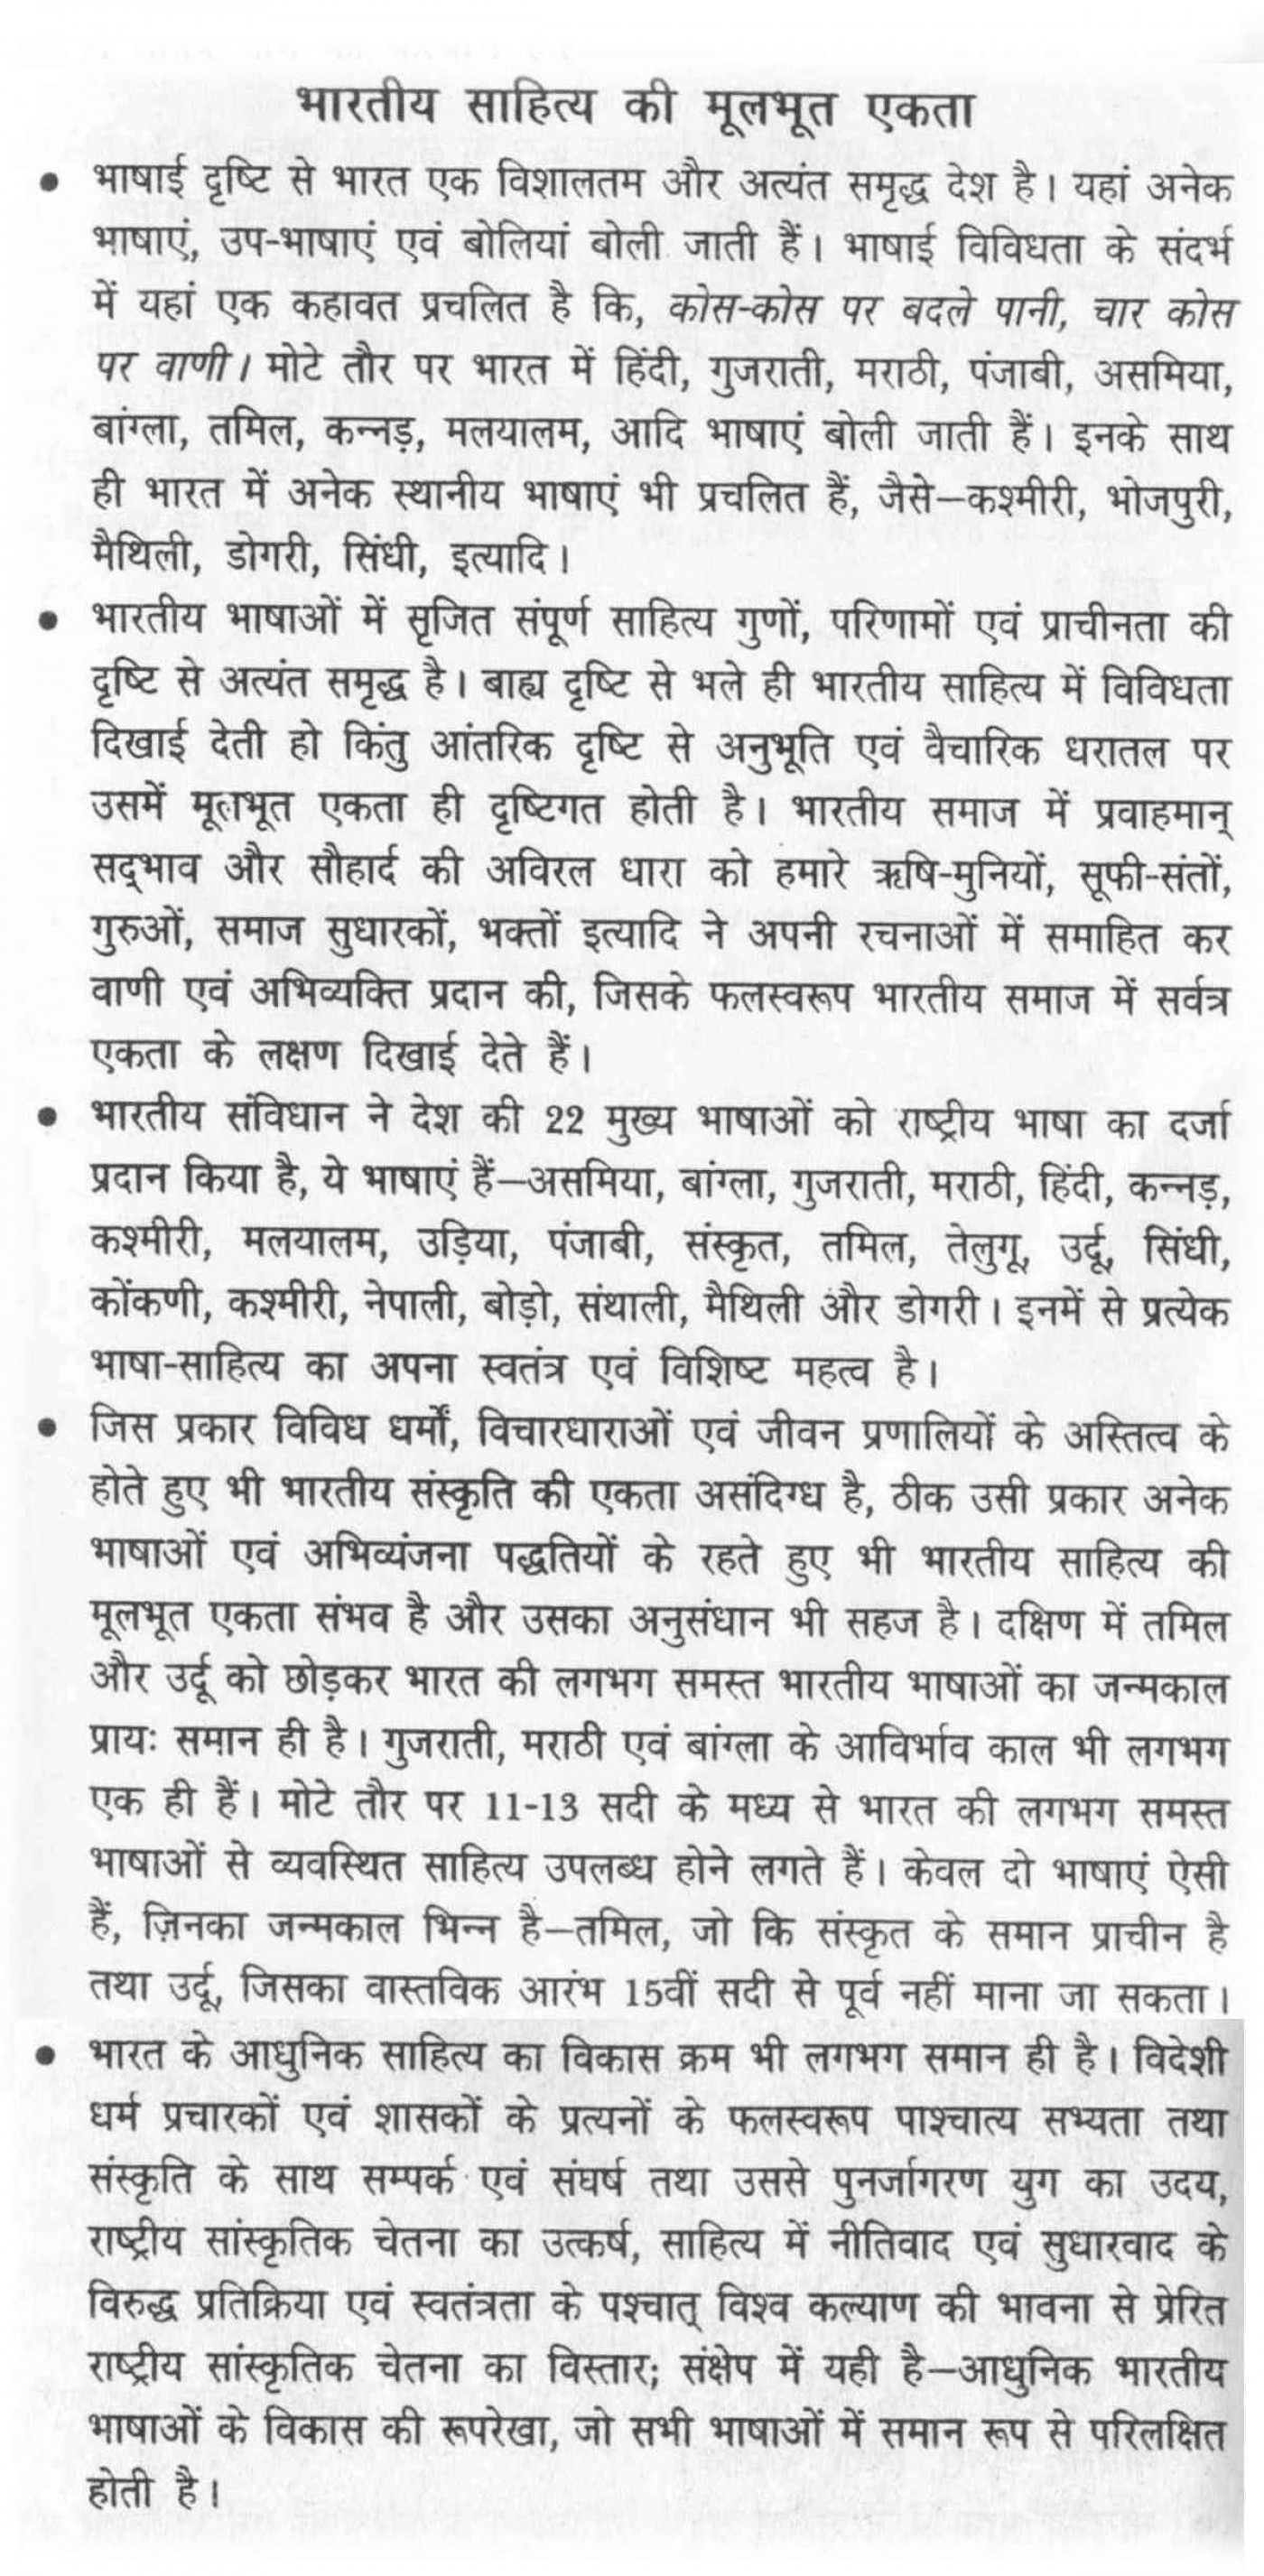 004 Greed Essay Example 11 Thumb2 Awful Greedy Dog In Hindi Topics Is A Curse 1400